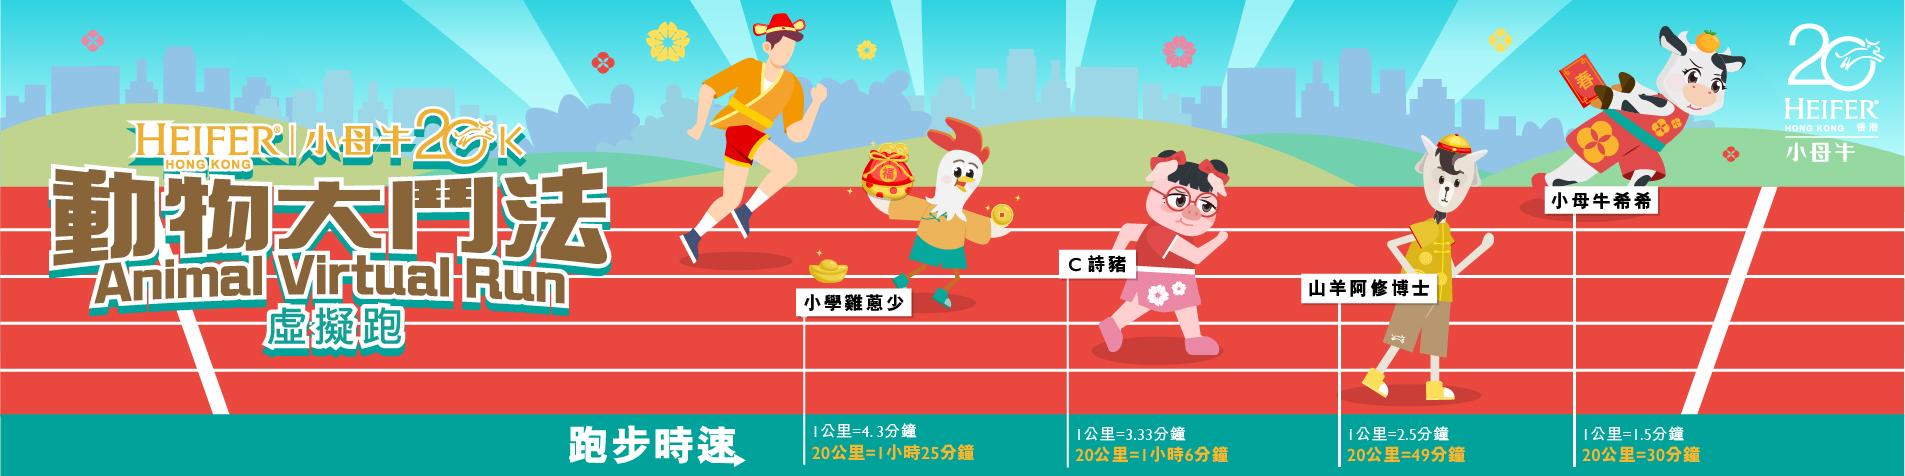 FringeBacker 籌款大使 小母牛20動物大鬥法虛擬跑